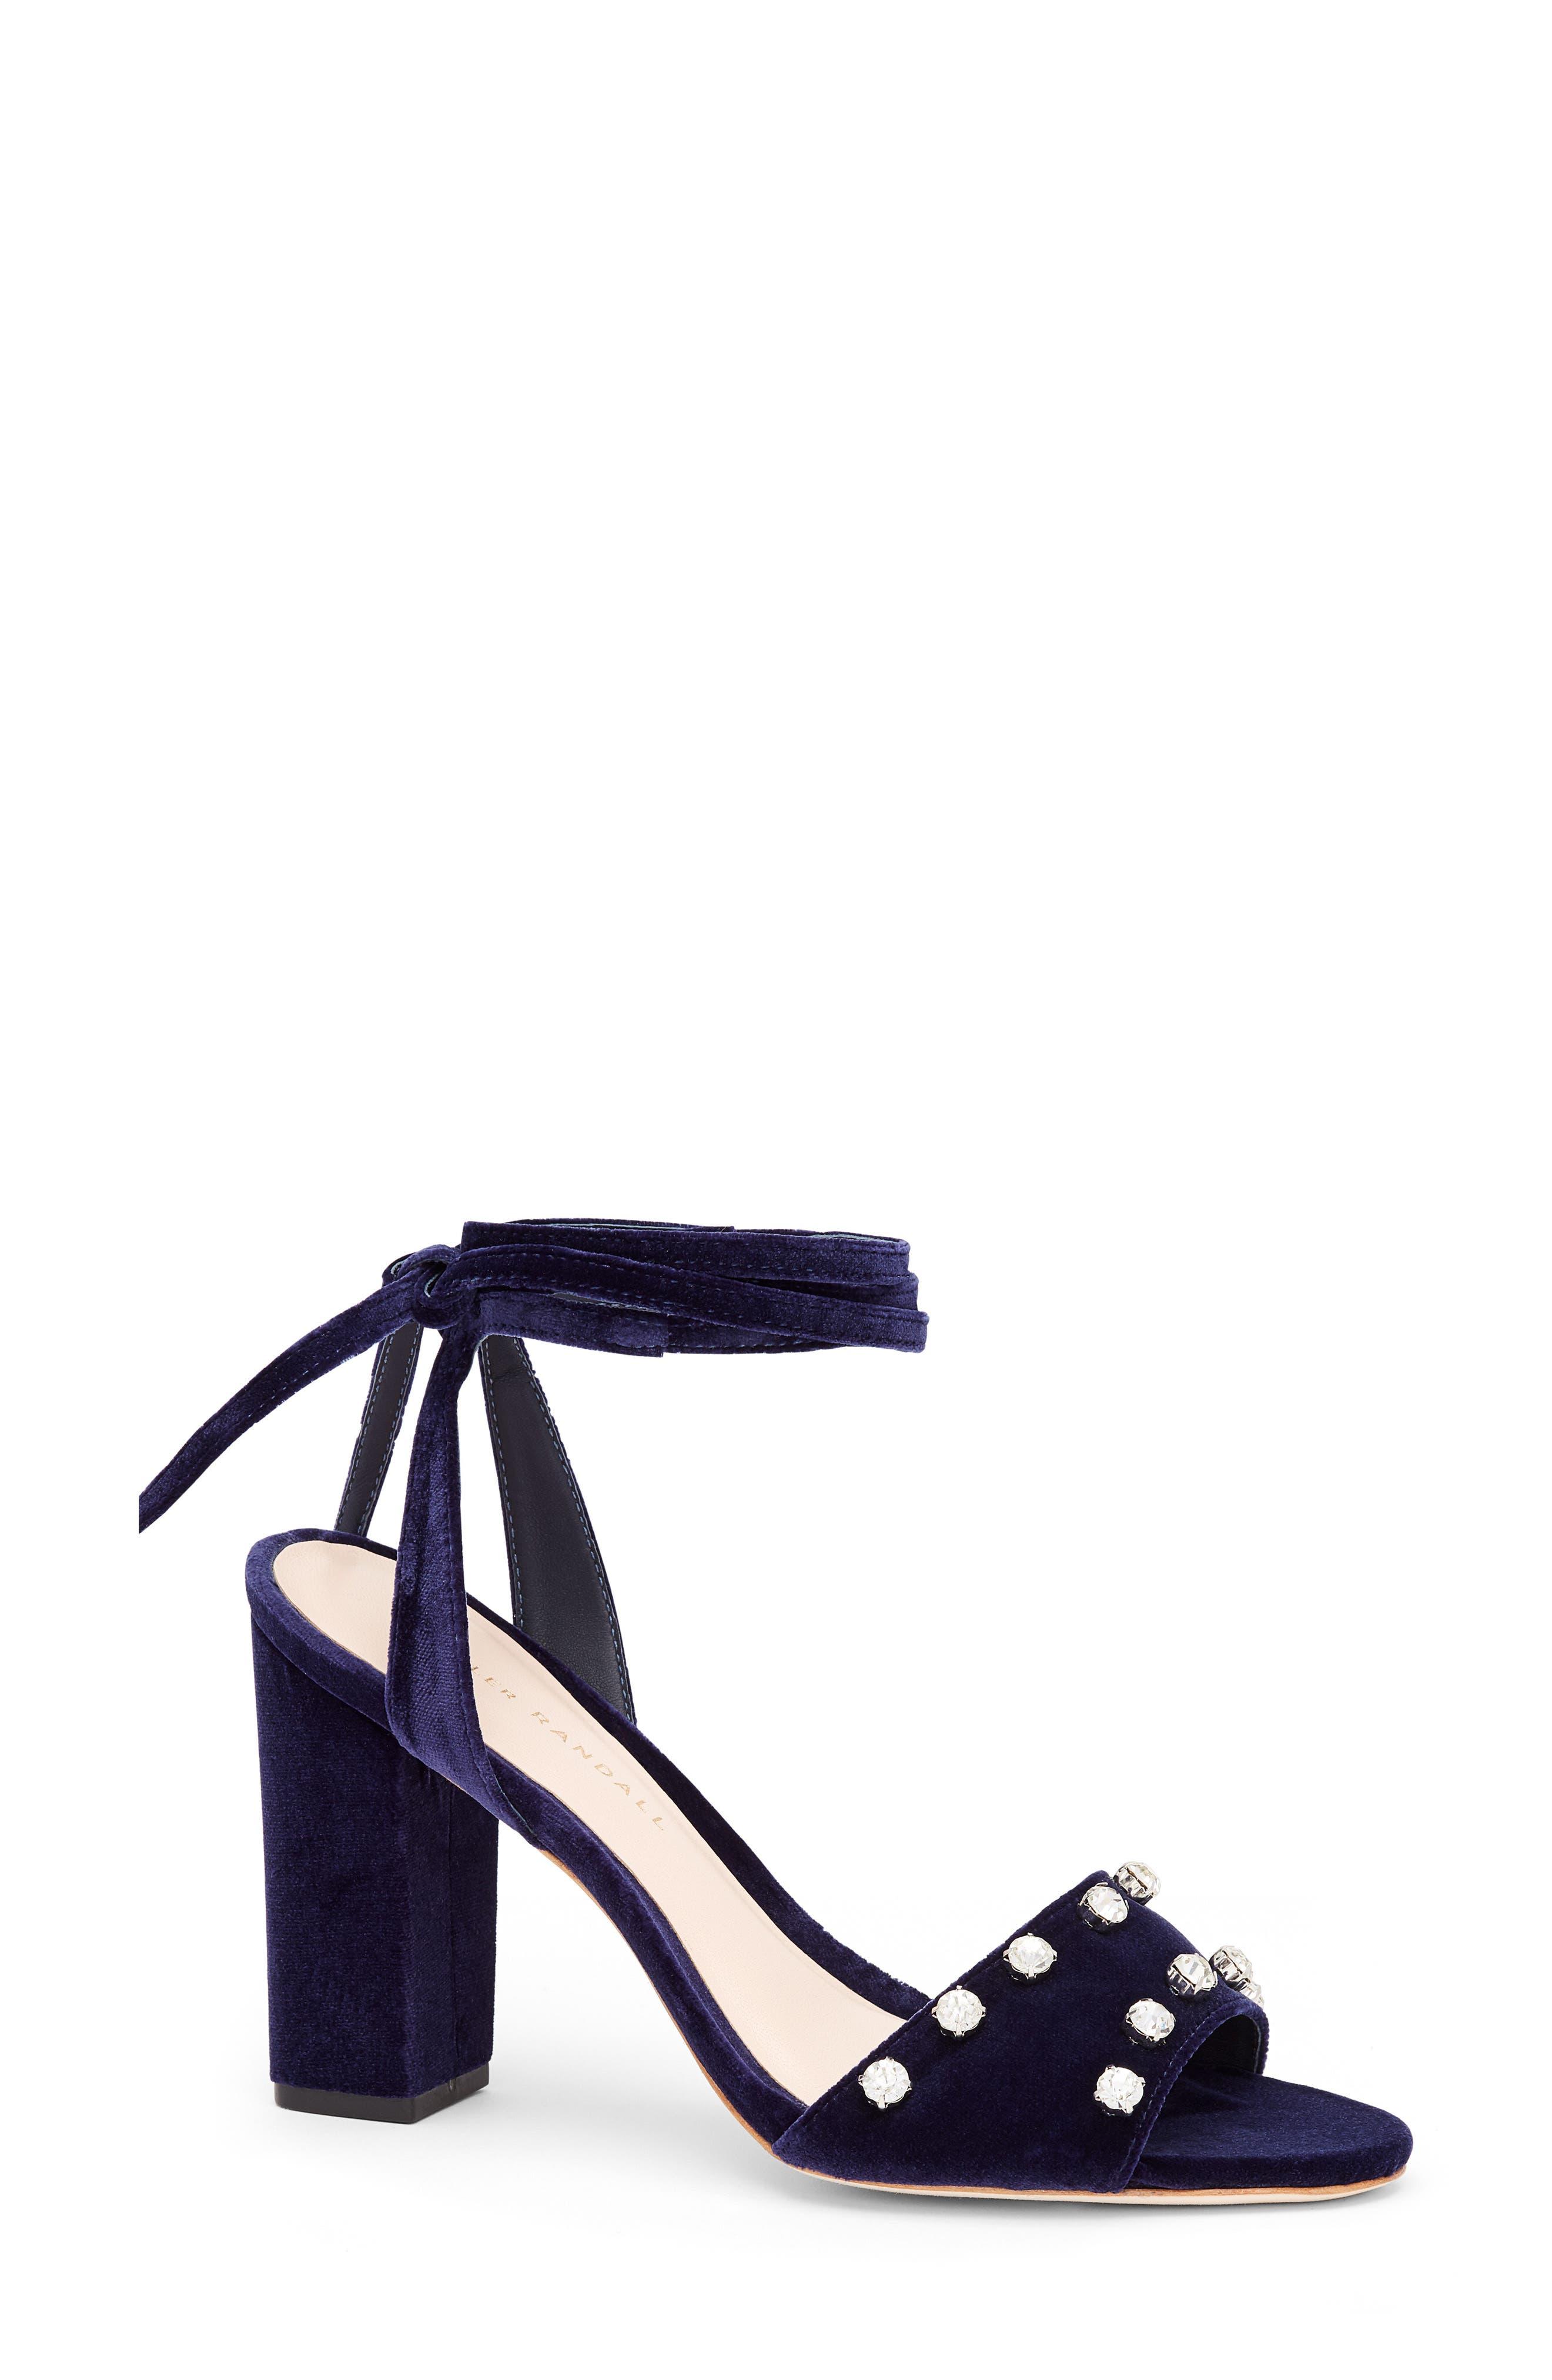 Elayna Ankle Wrap Sandal,                             Main thumbnail 1, color,                             414